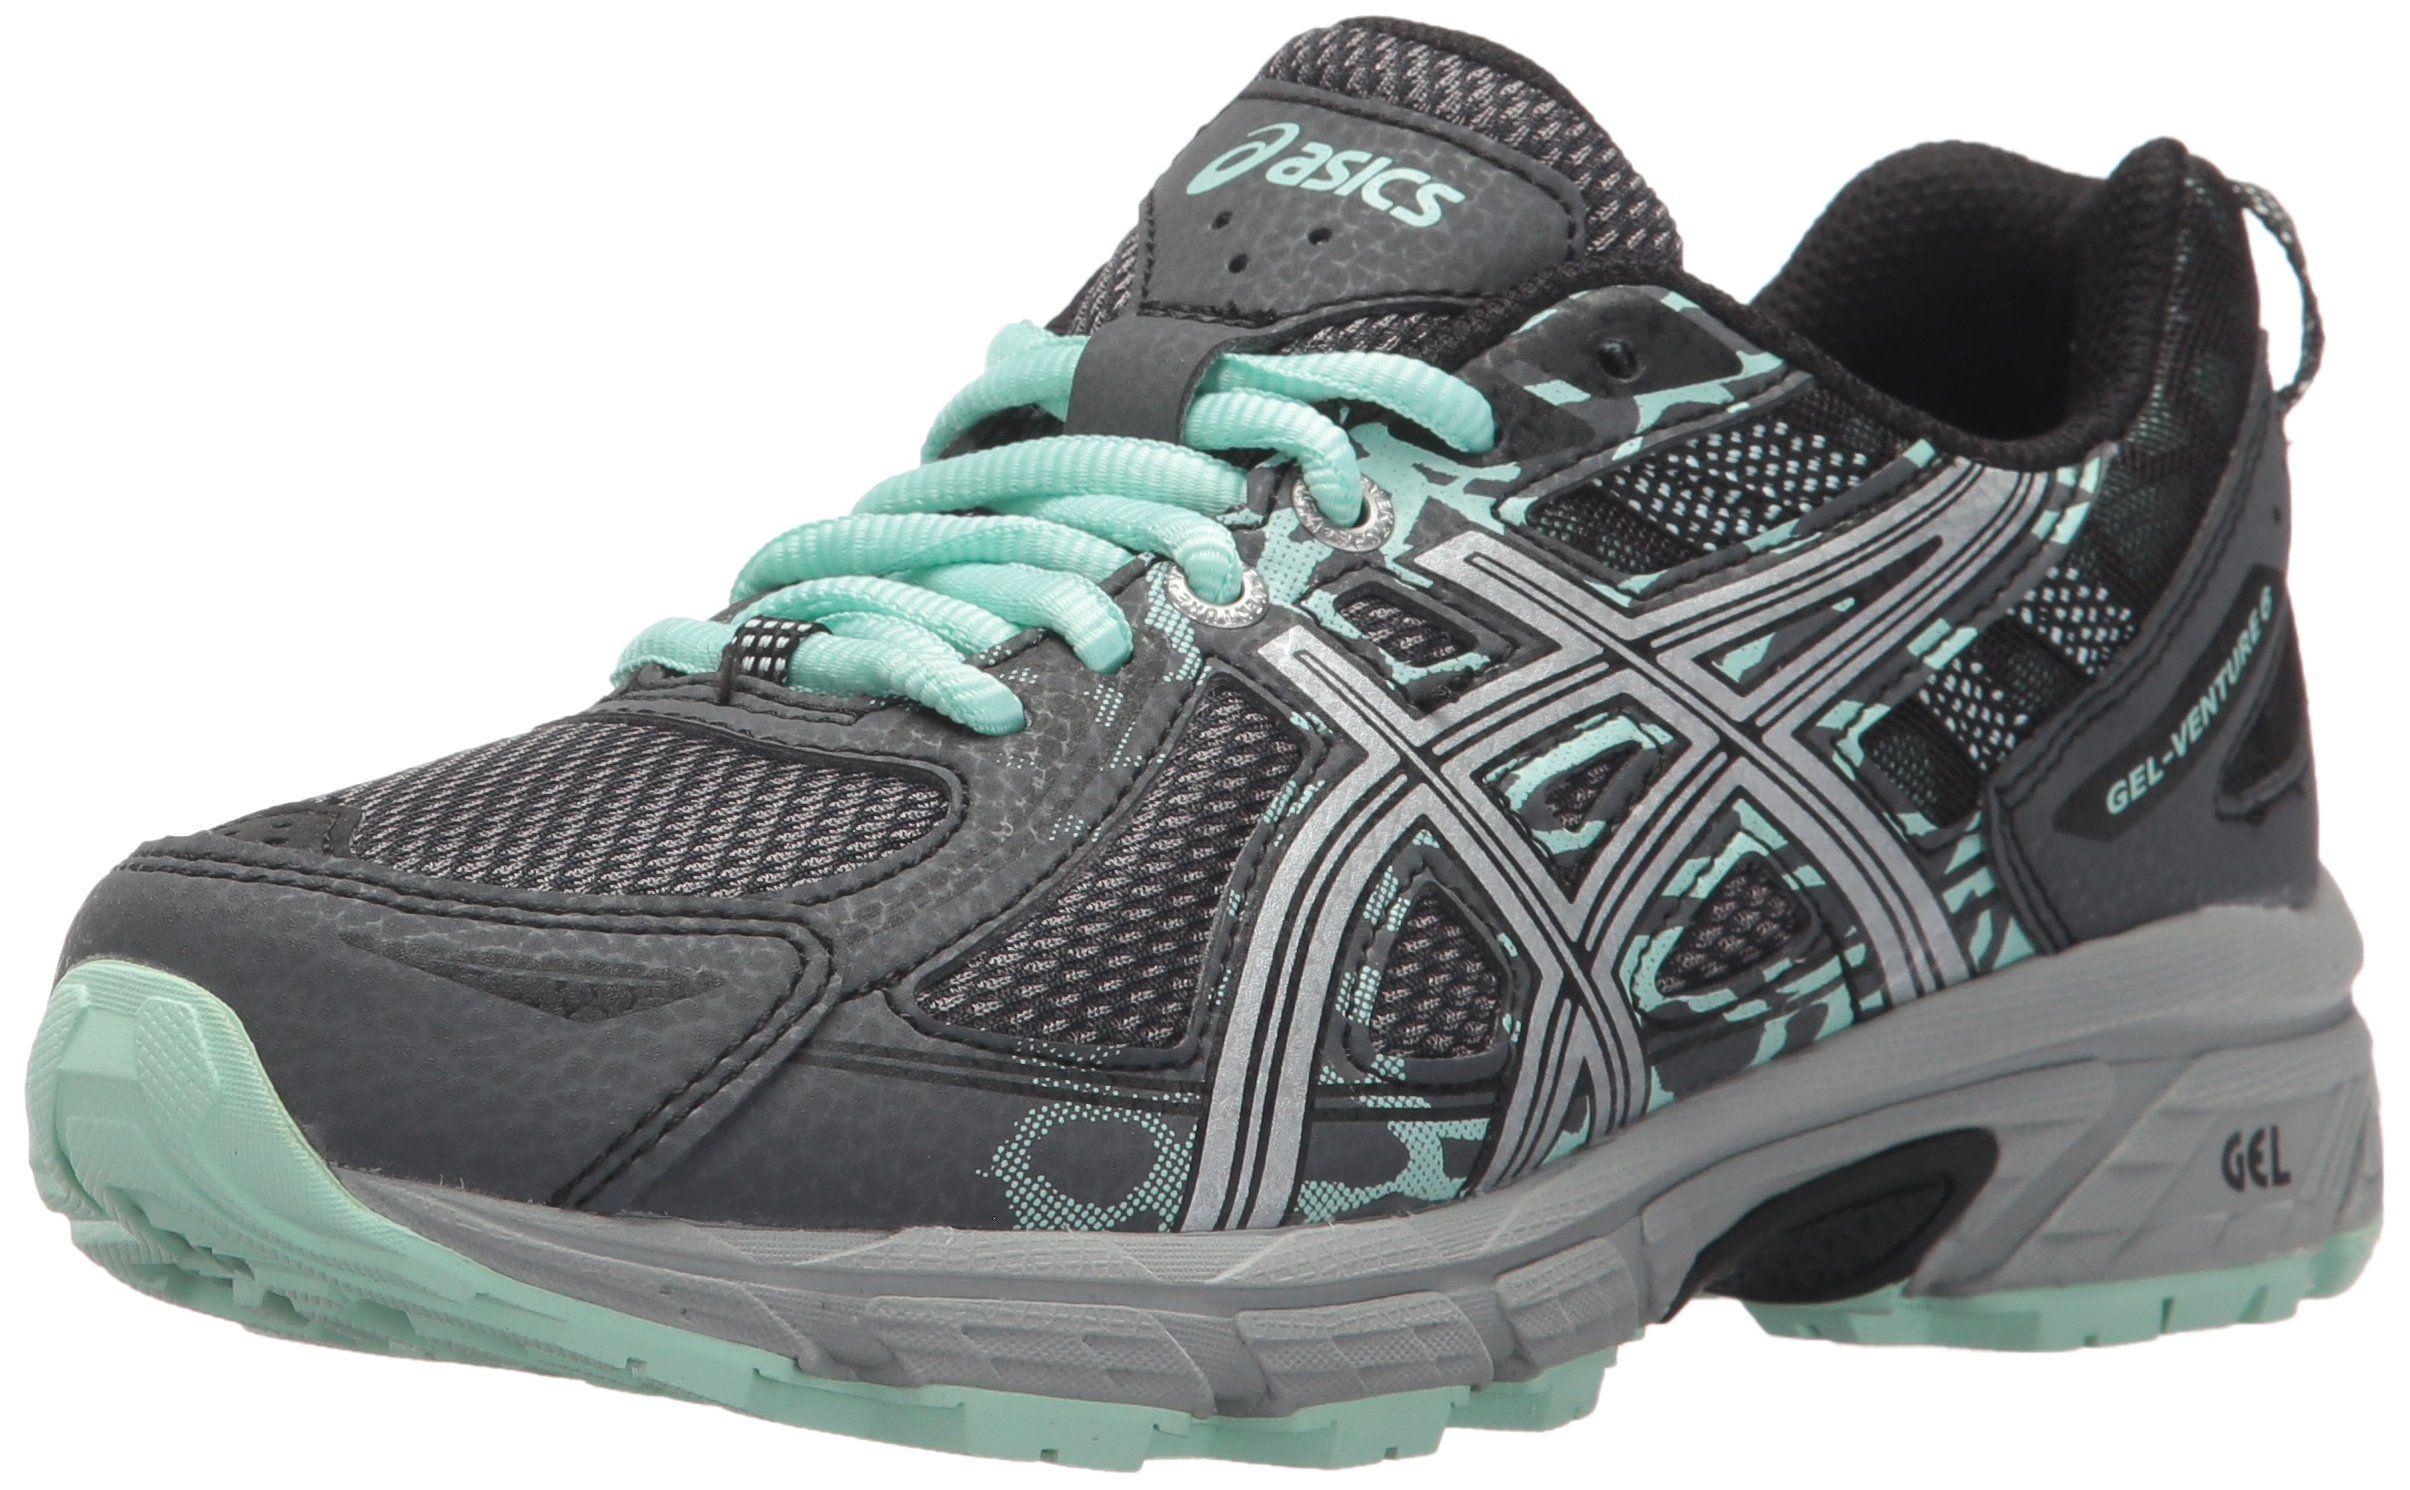 Best trail running shoes, Asics running